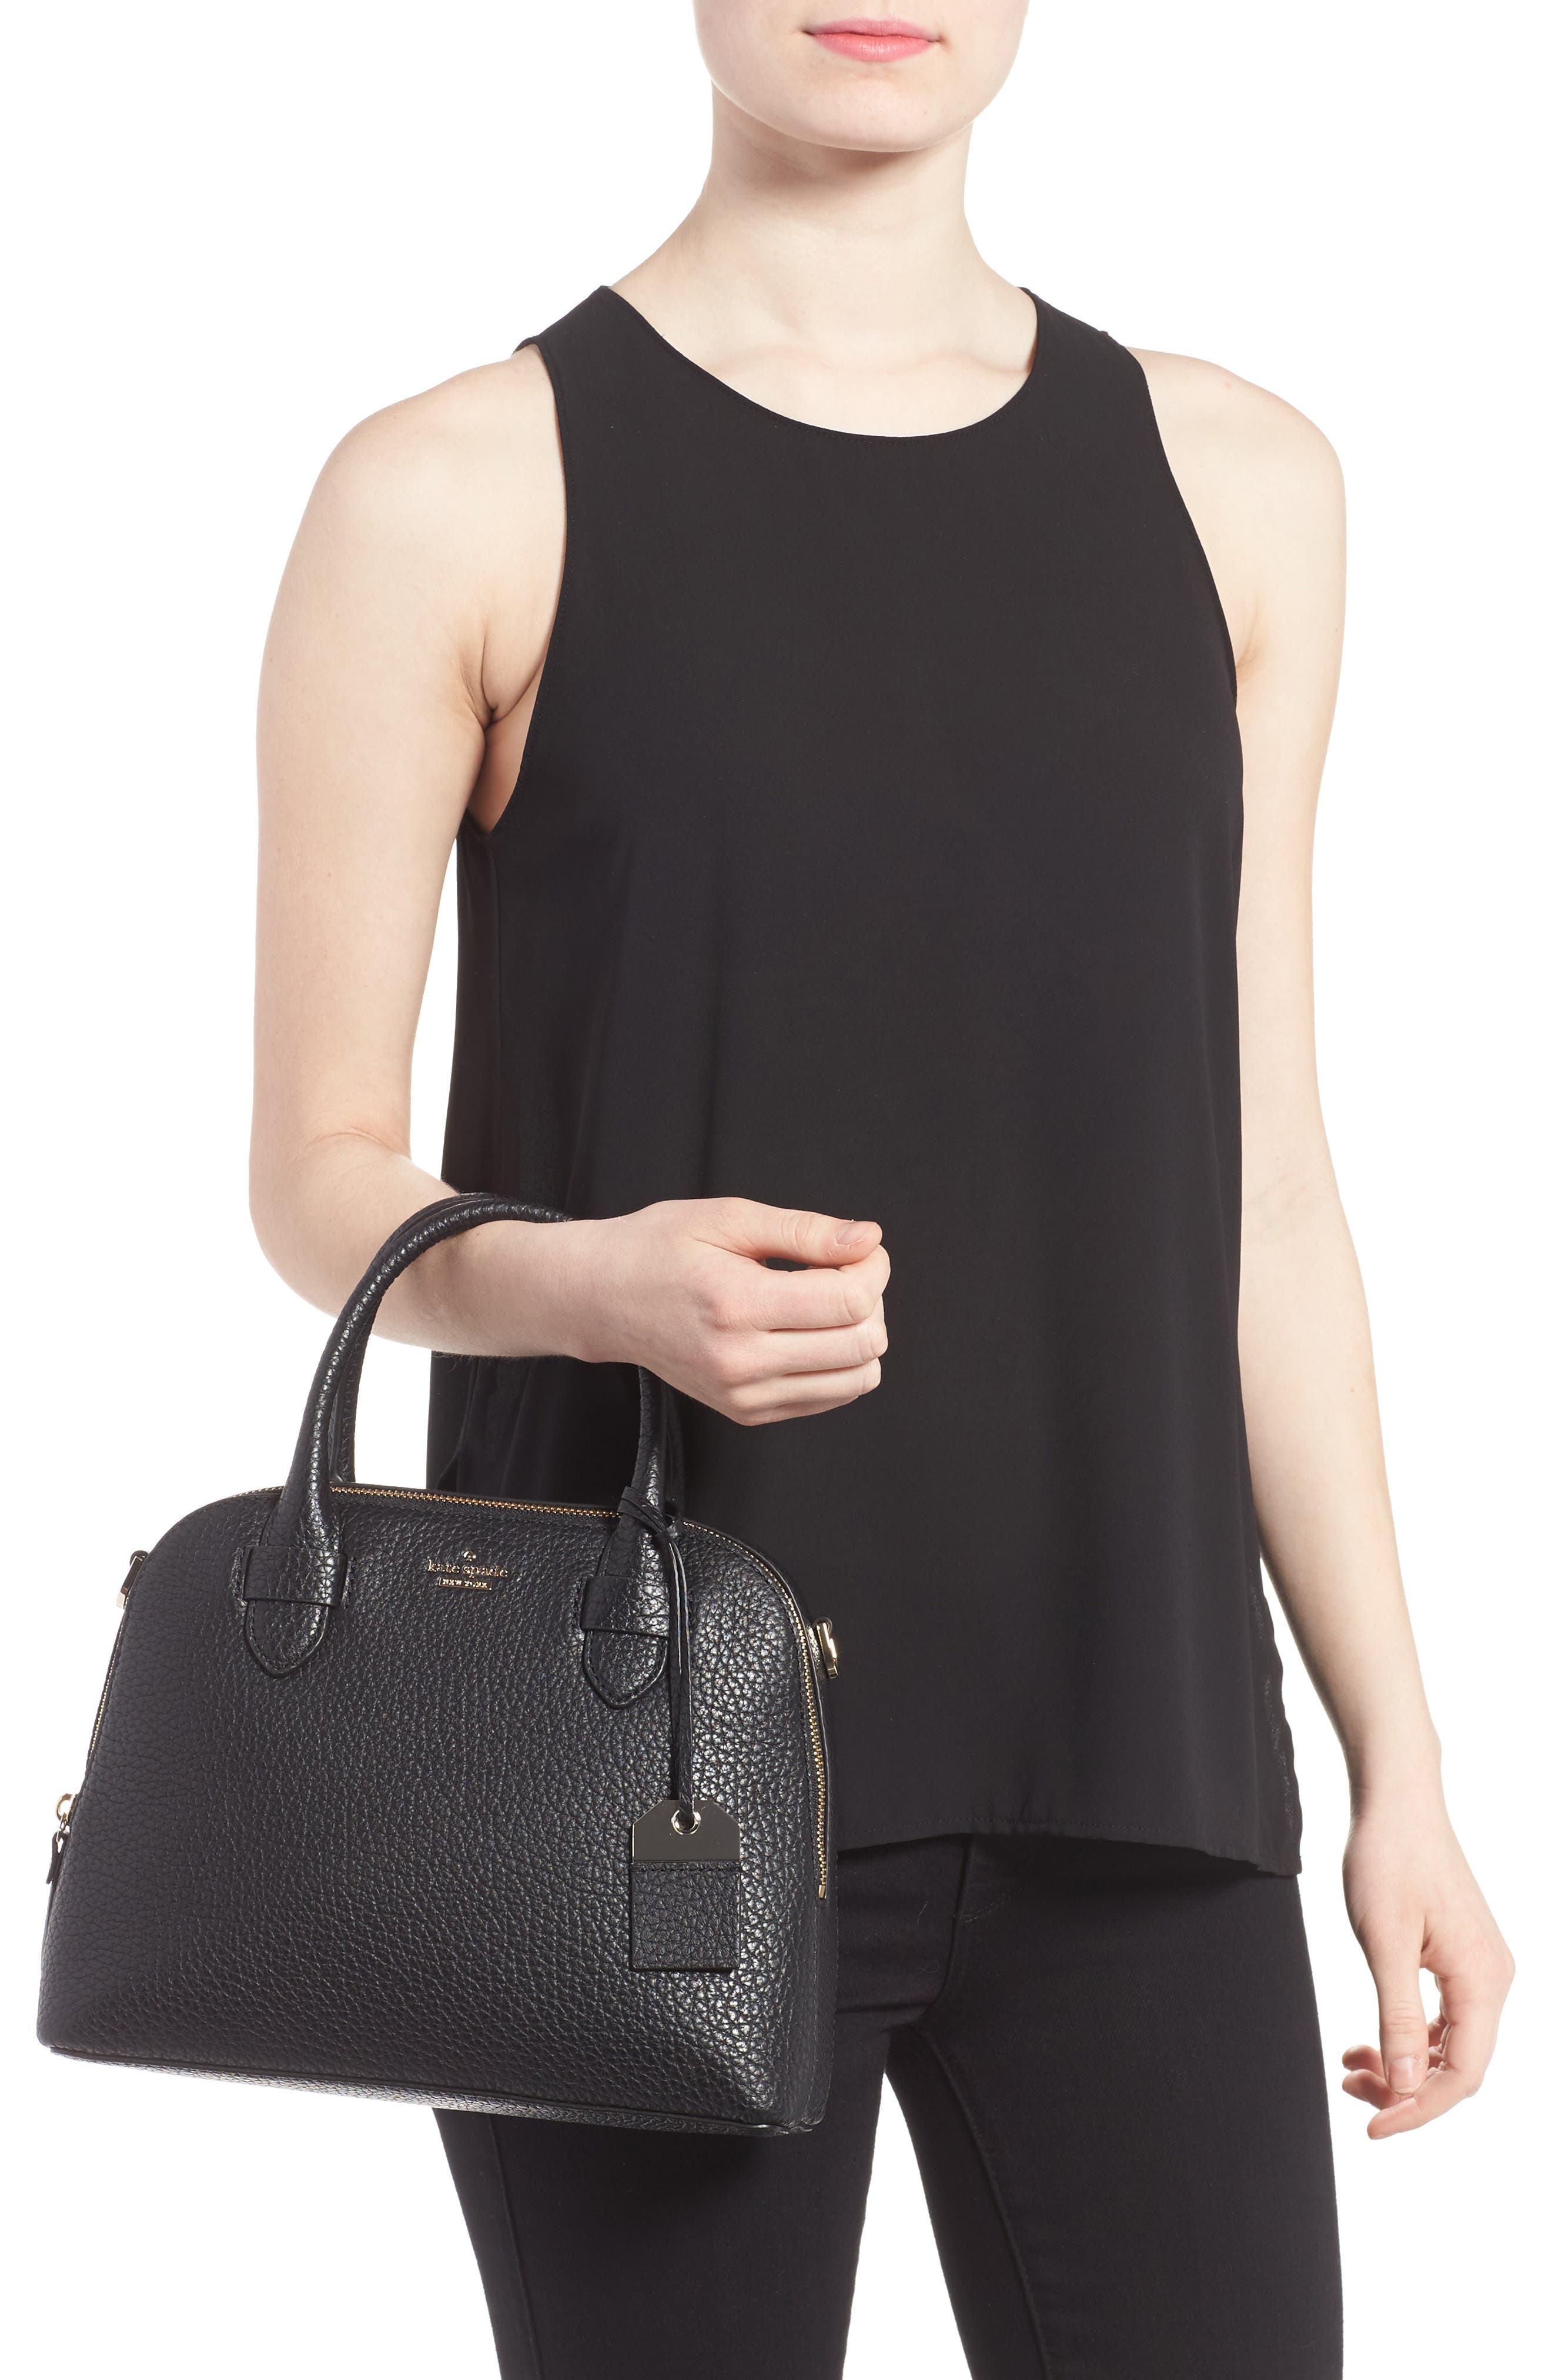 carter street - small ashleigh leather satchel,                             Alternate thumbnail 2, color,                             001